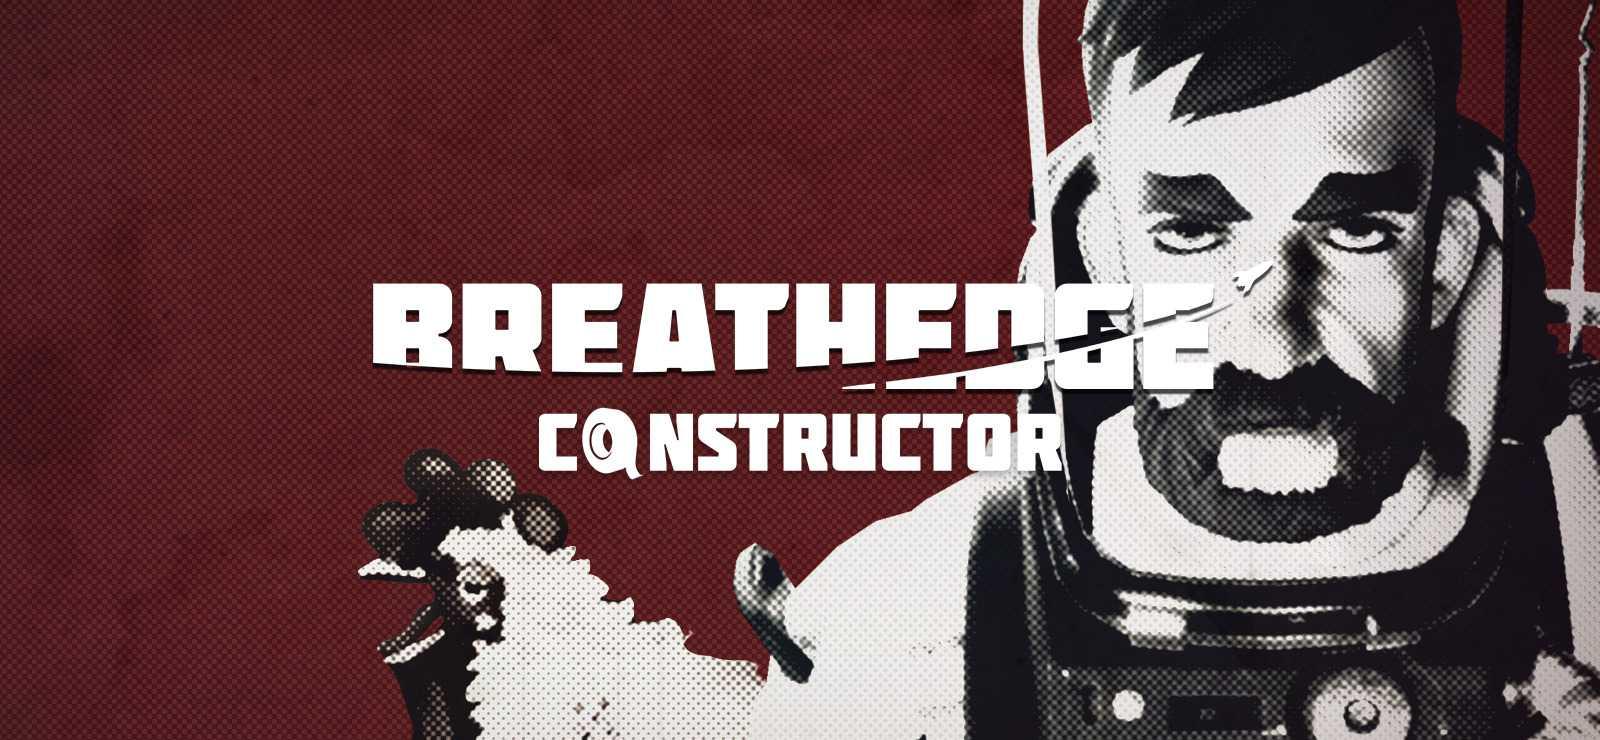 Breathedge: Constructor